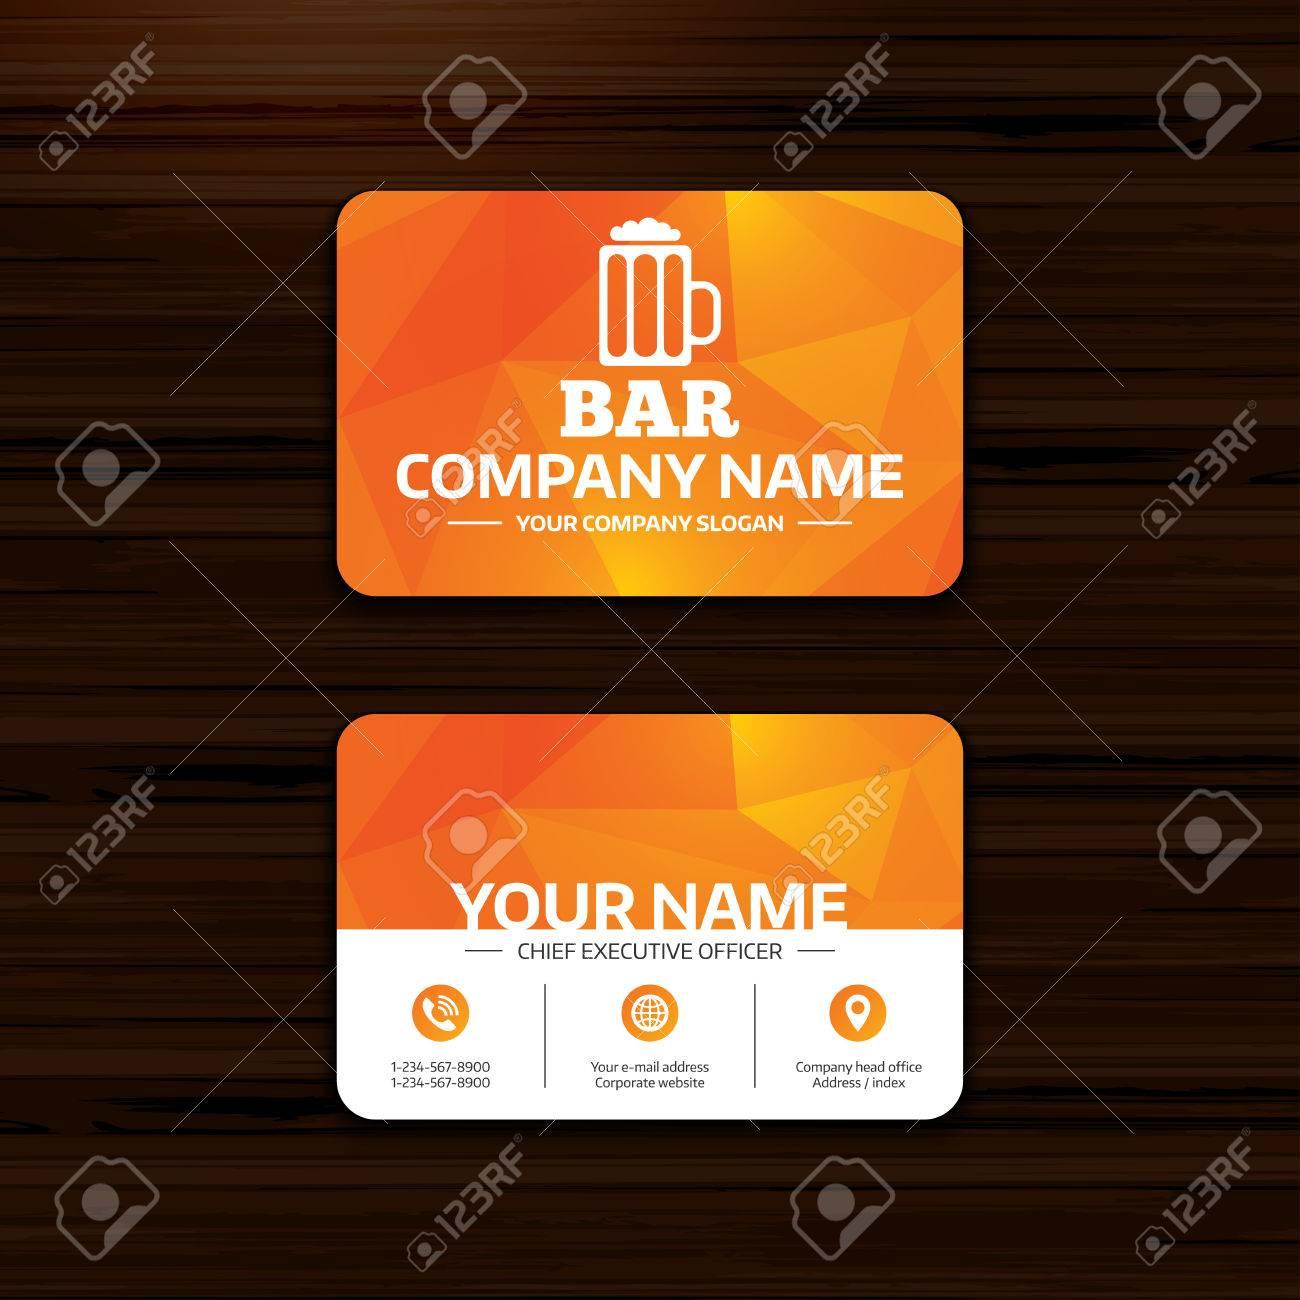 Daffaires Ou En Visite Modele De Carte Bar Signe Pub Icone